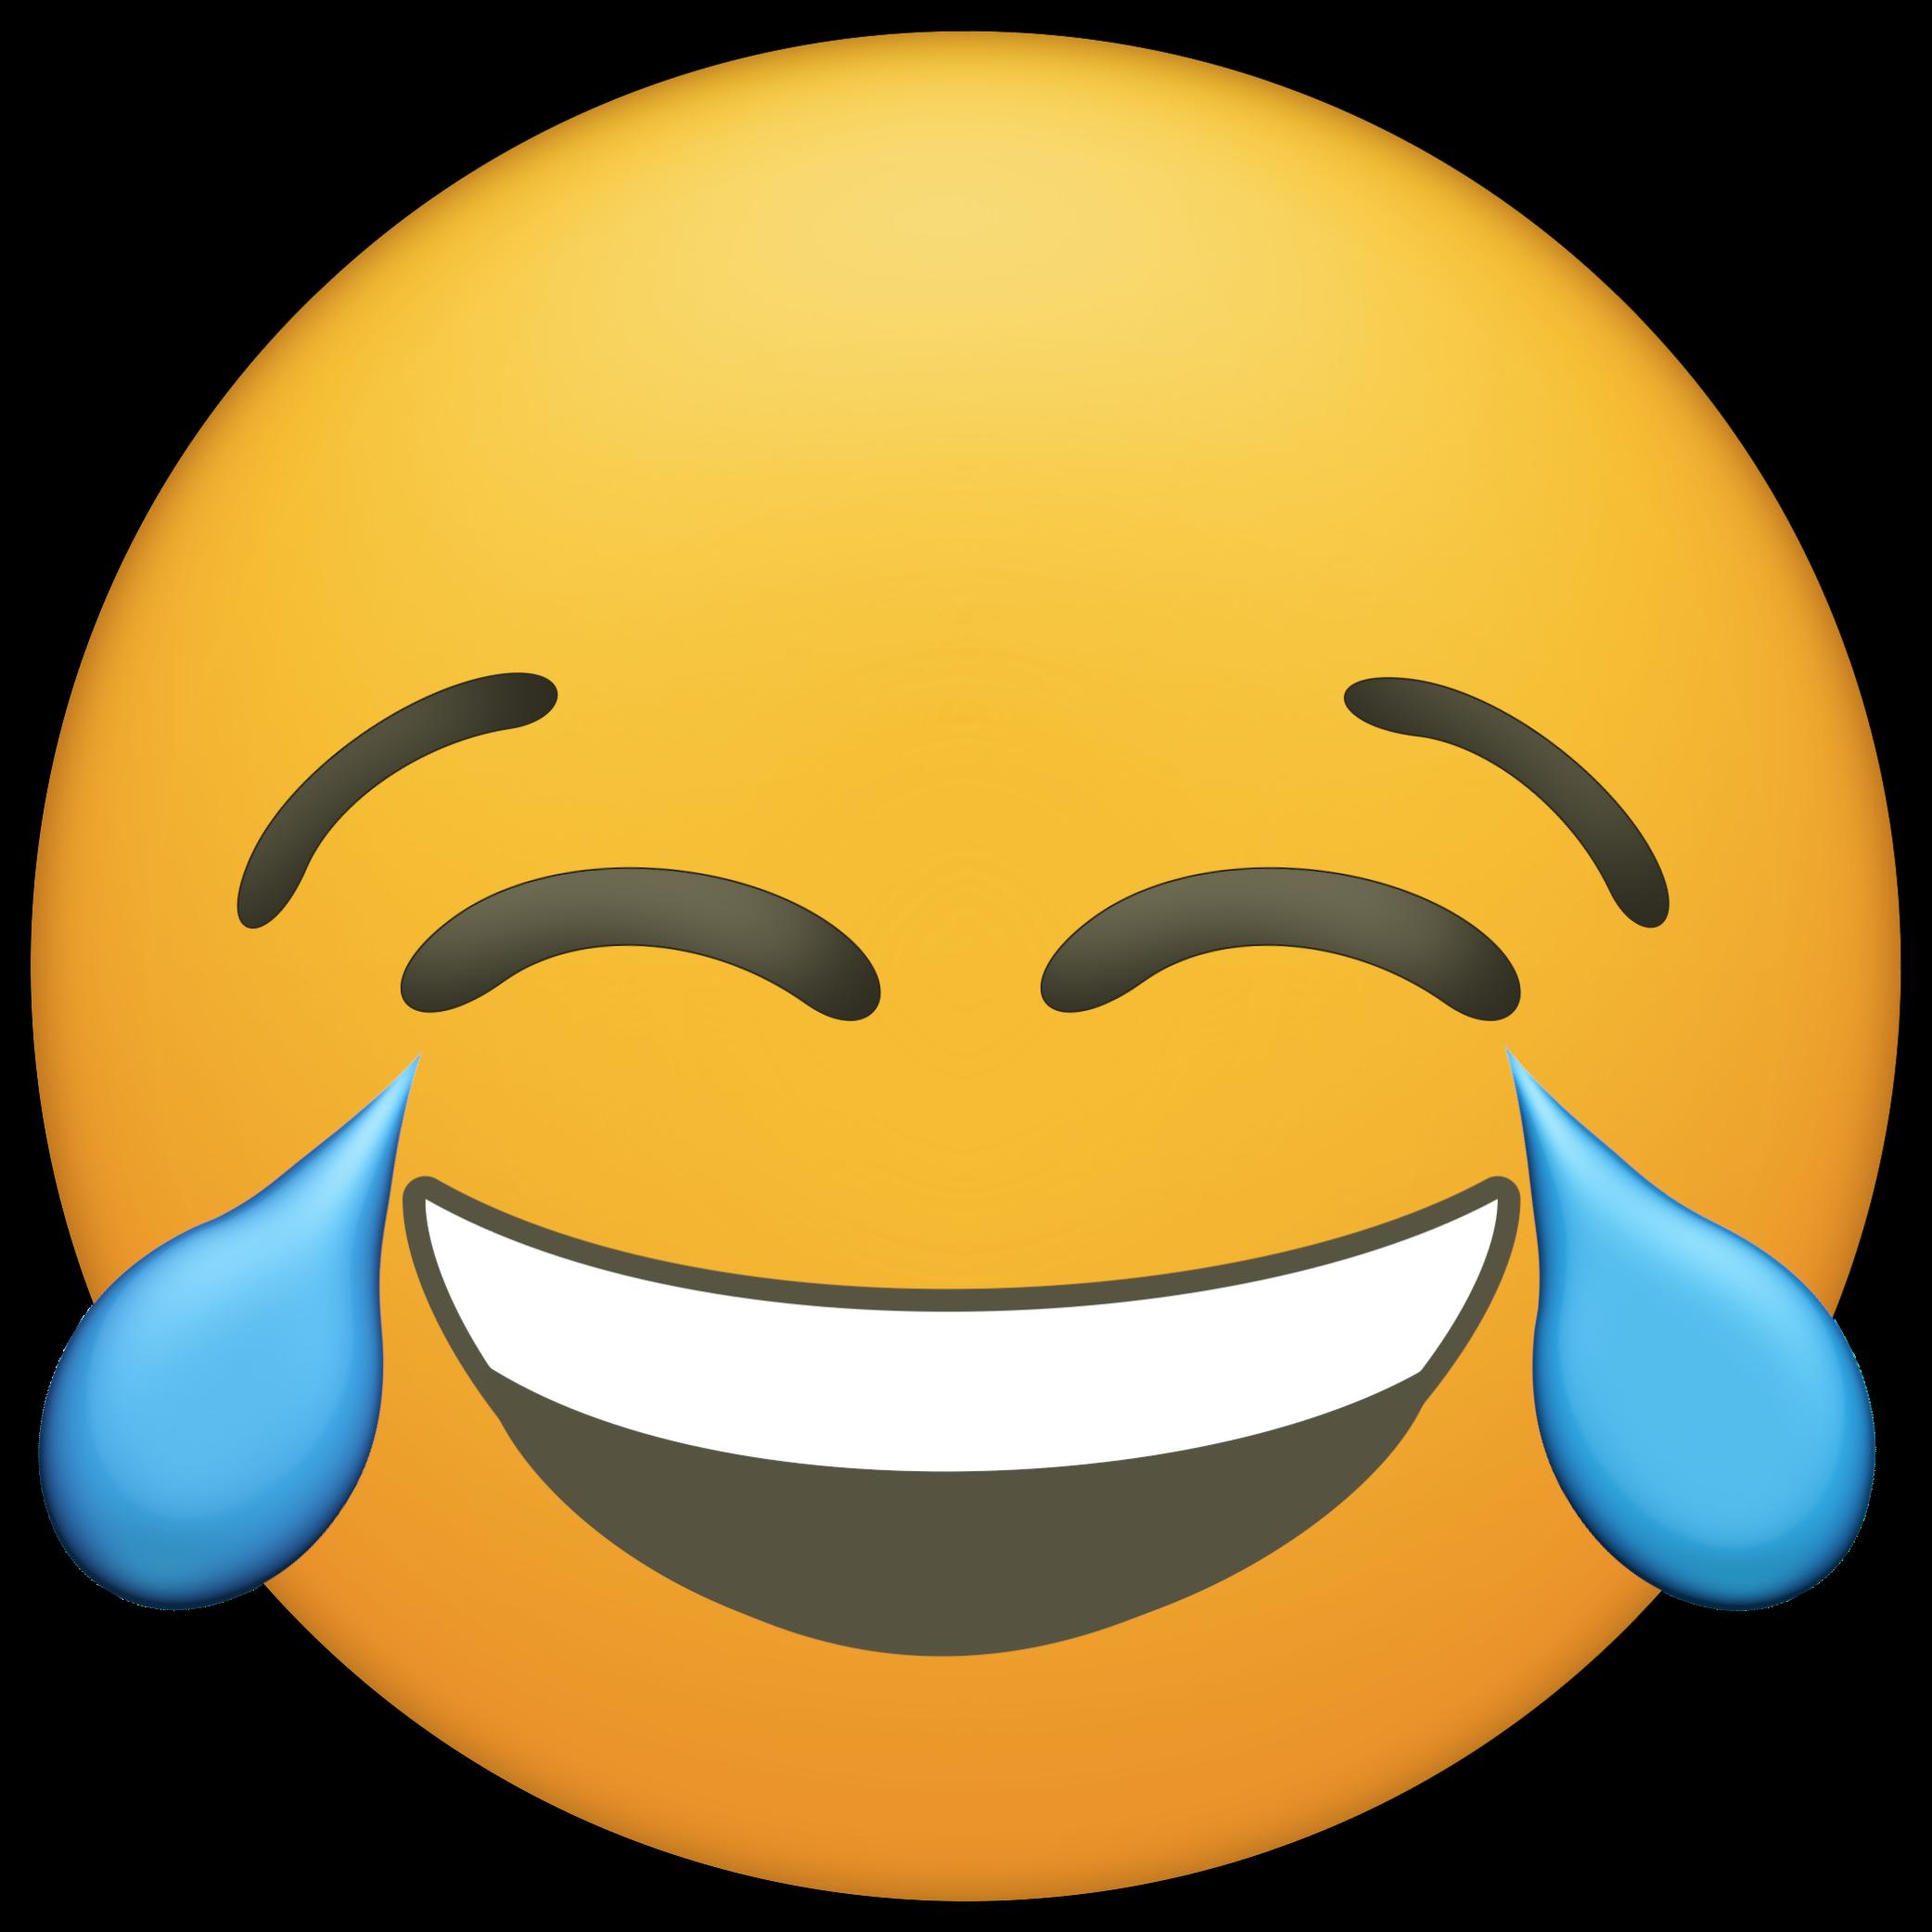 Crying Laughing Png 2083 2083 Fotos De Emoji Imagenes De Emoji Emojis